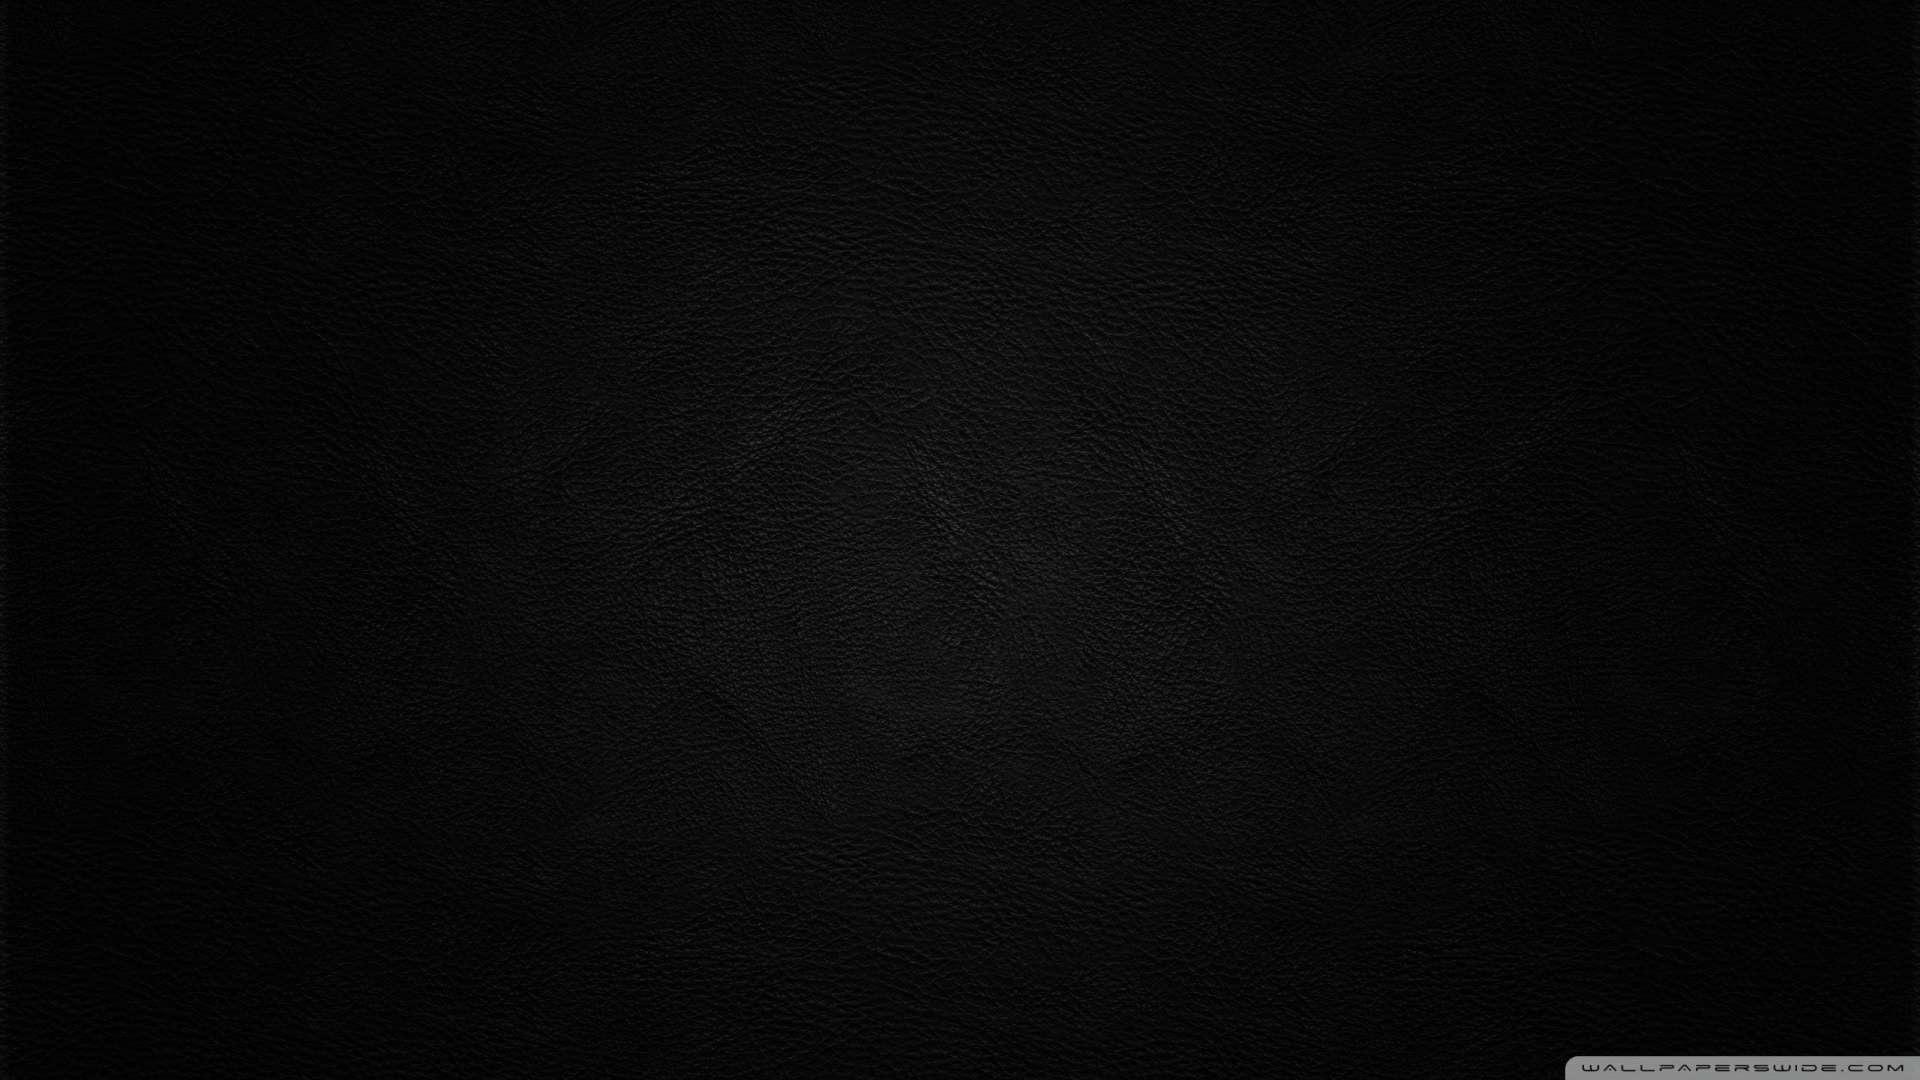 Download Black Background Leather Wallpaper 1080p HD HDWallWidecom 1920x1080